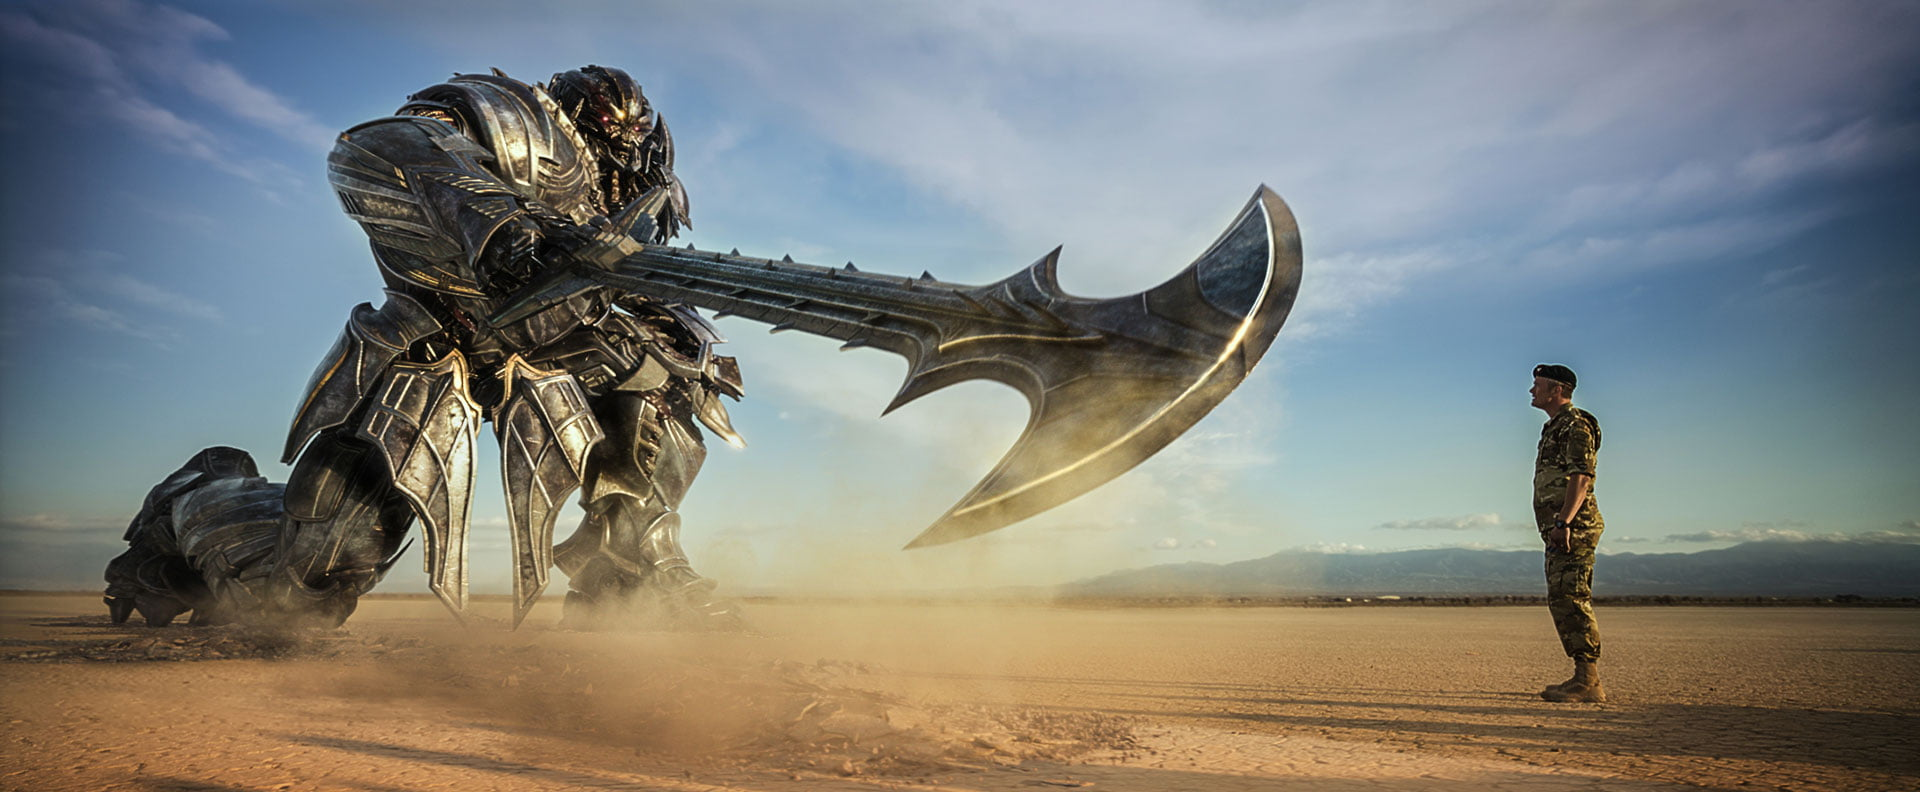 Трансформери: Останній лицар / Transformers: The Last Knight (2017)